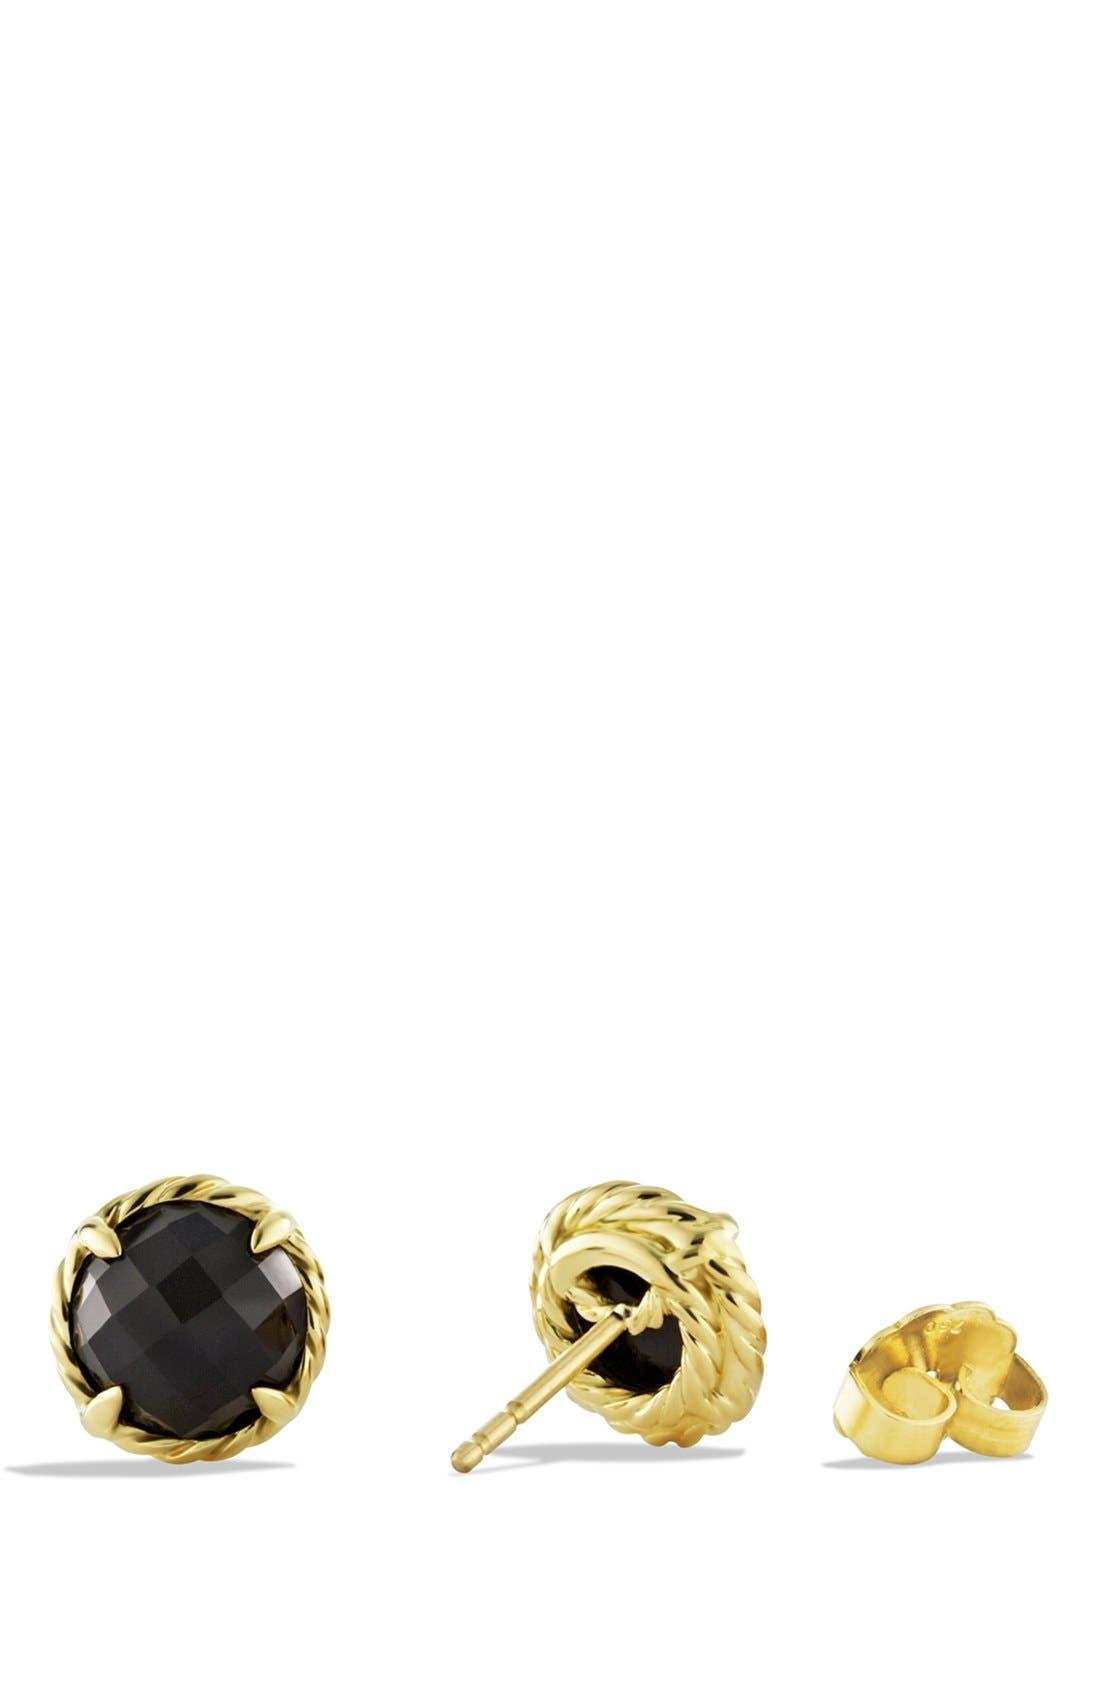 'Châtelaine' Earrings,                             Alternate thumbnail 3, color,                             BLACK ONYX